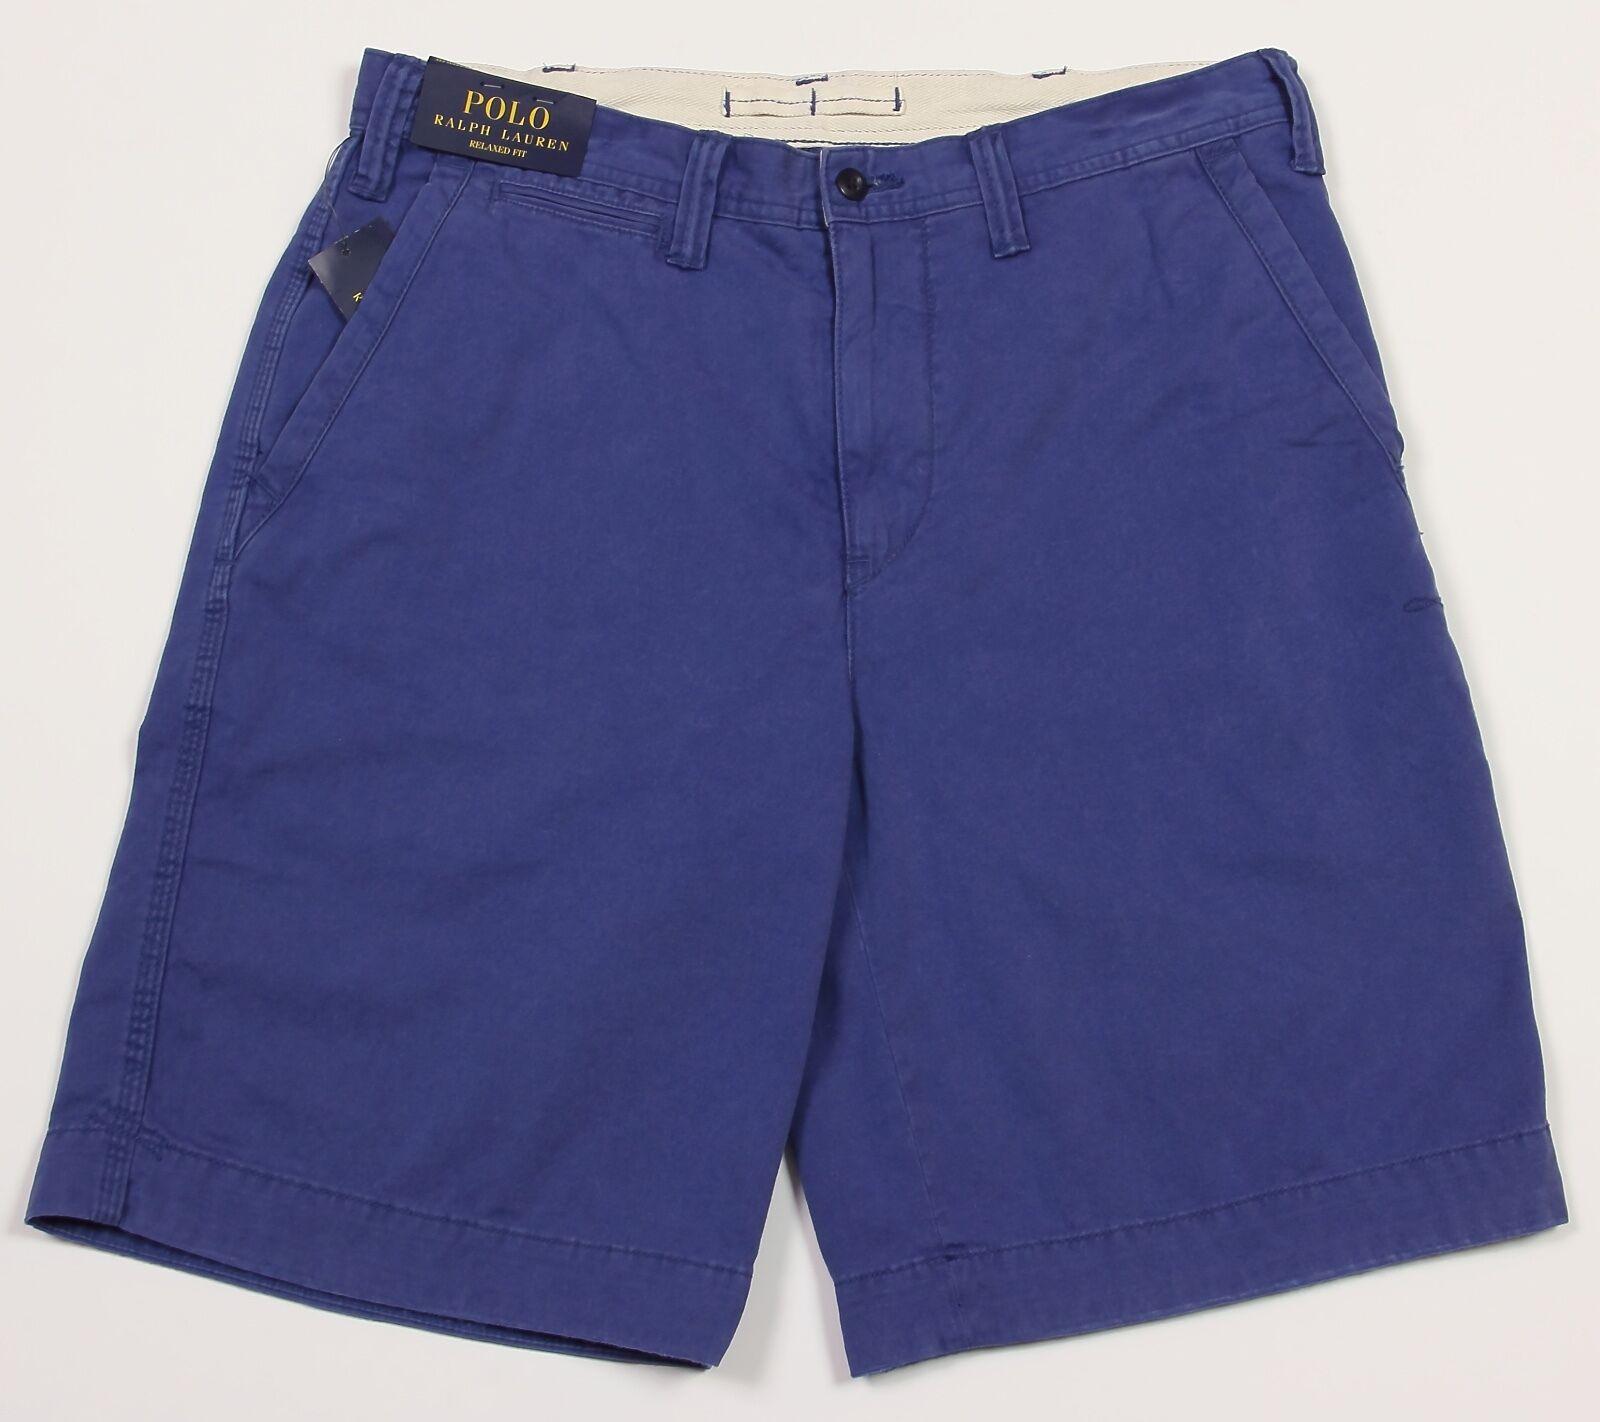 6685c37f6969c Men's POLO RALPH LAUREN Sport bluee Logo Fatigue Utility Shorts 40 NWT NEW  Cool